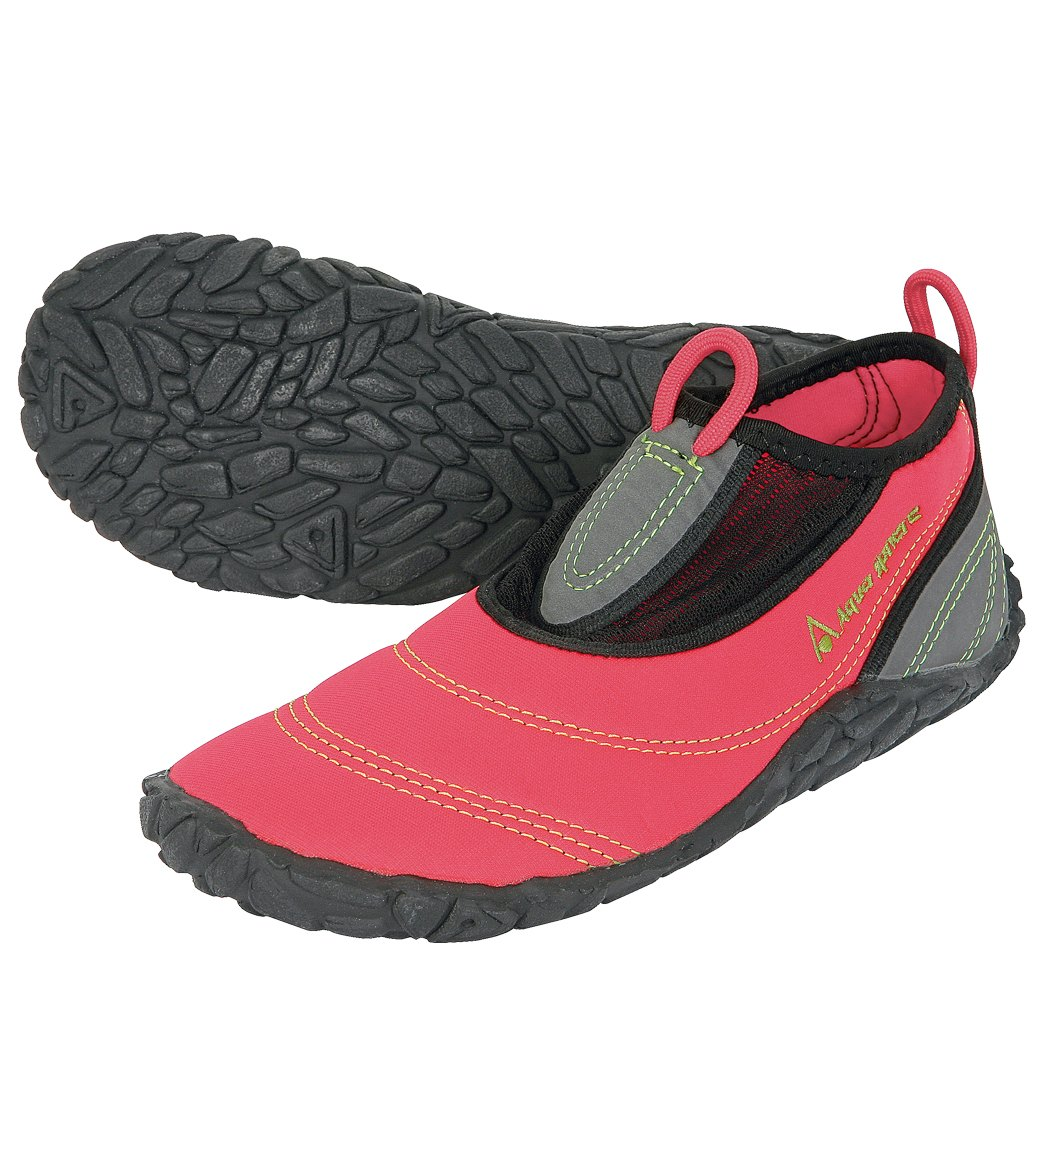 b77c7a41ff75 Aqua Sphere Women s Beachwalker XP Water Shoes at SwimOutlet ...